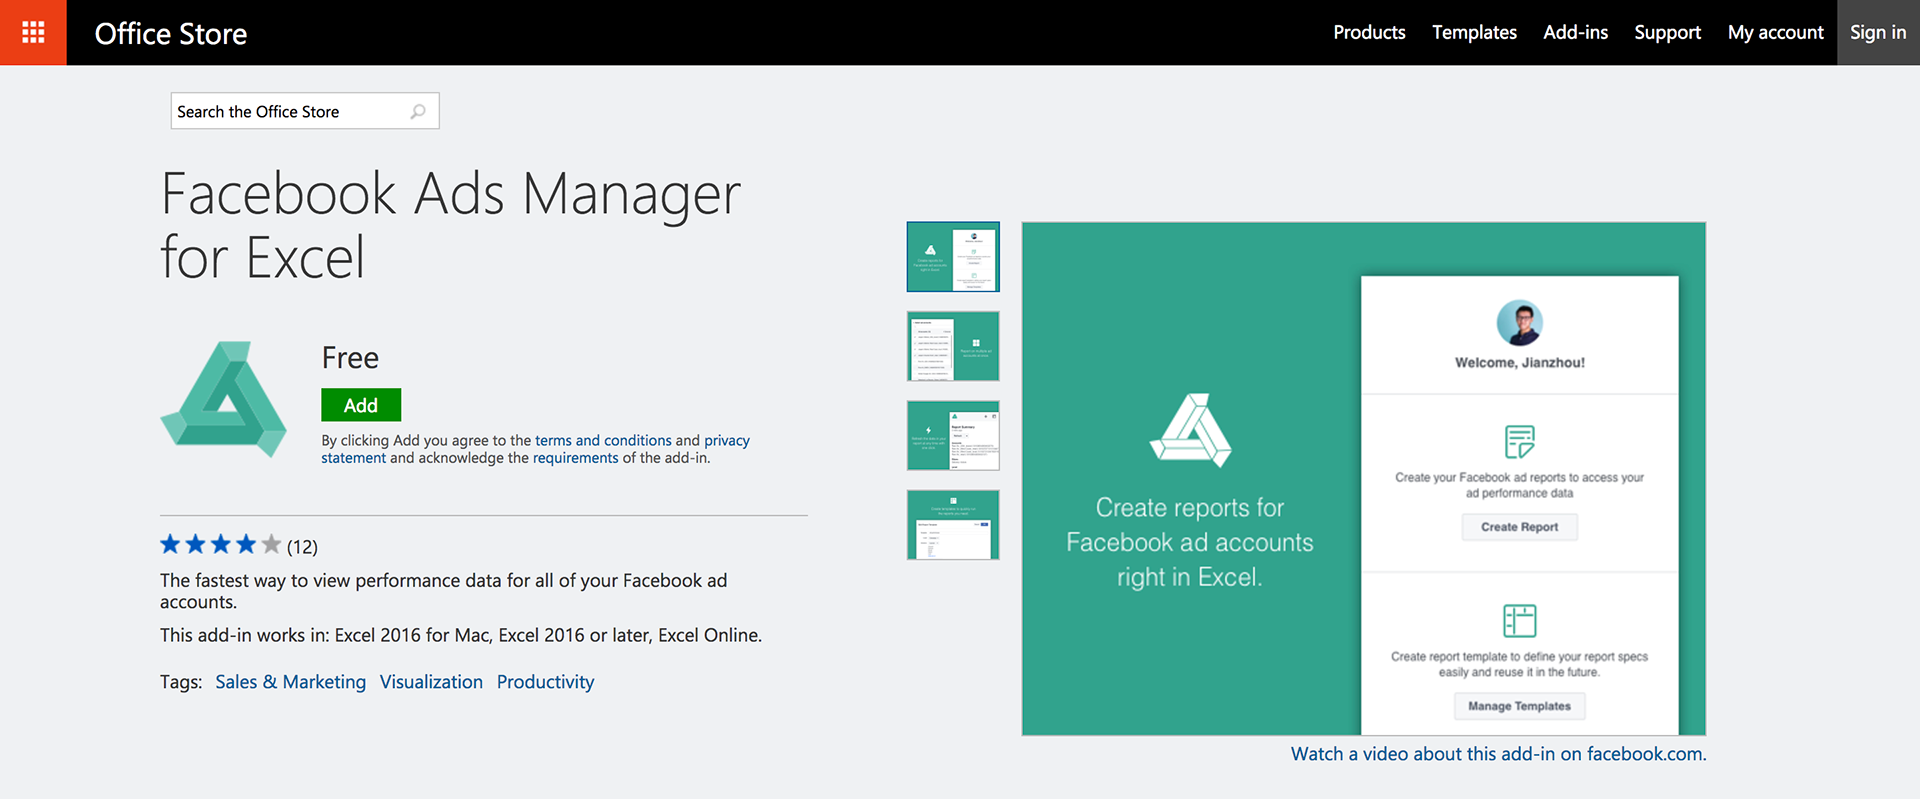 Leonardo De La Rocha Facebook Ads Manager For Excel - Facebook ads report template